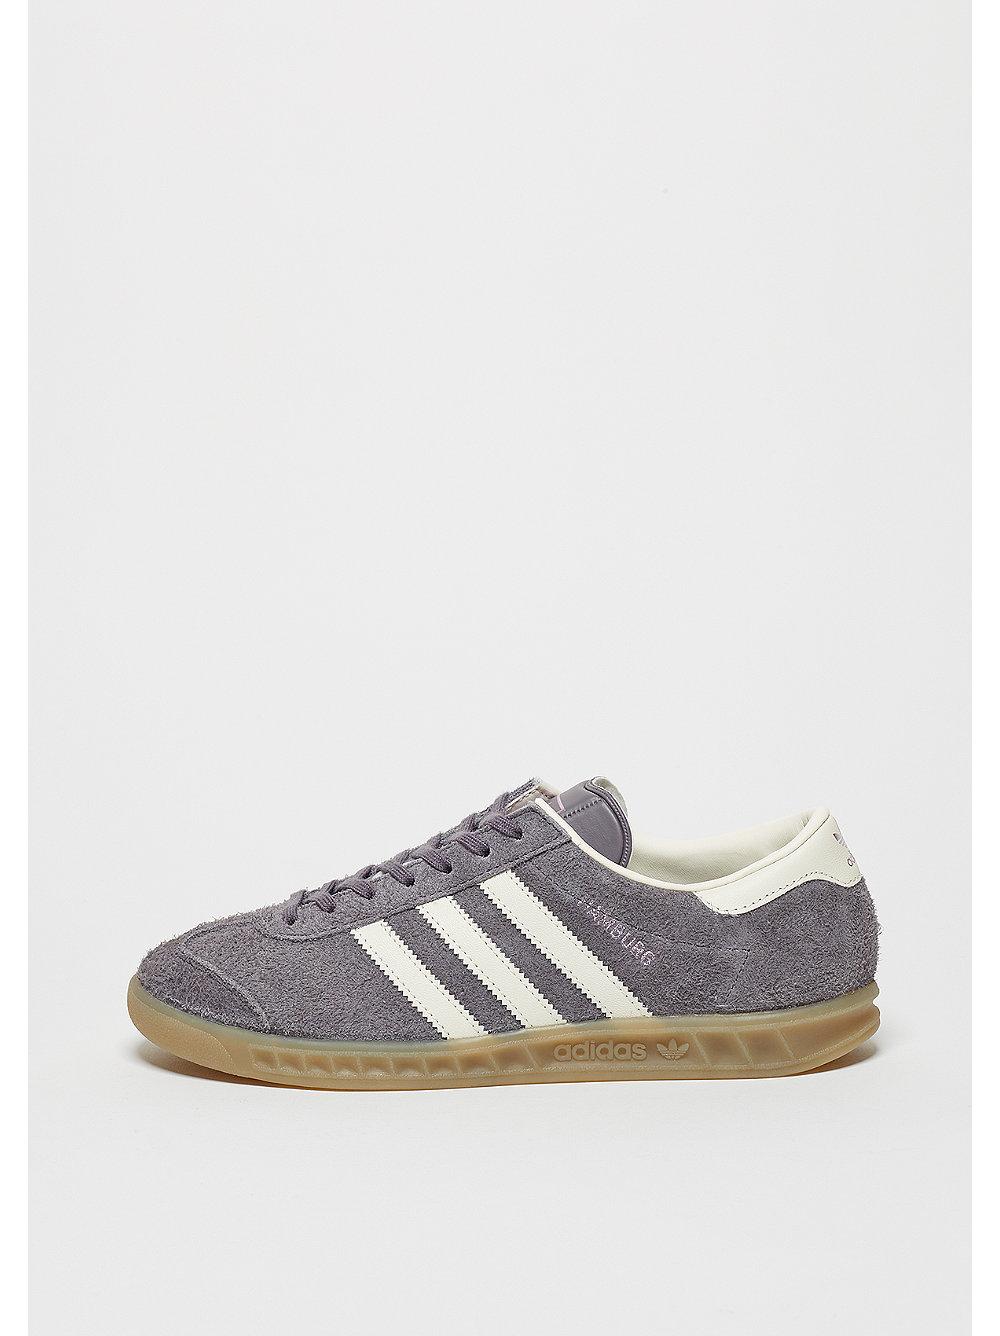 adidas Hamburg trace grey